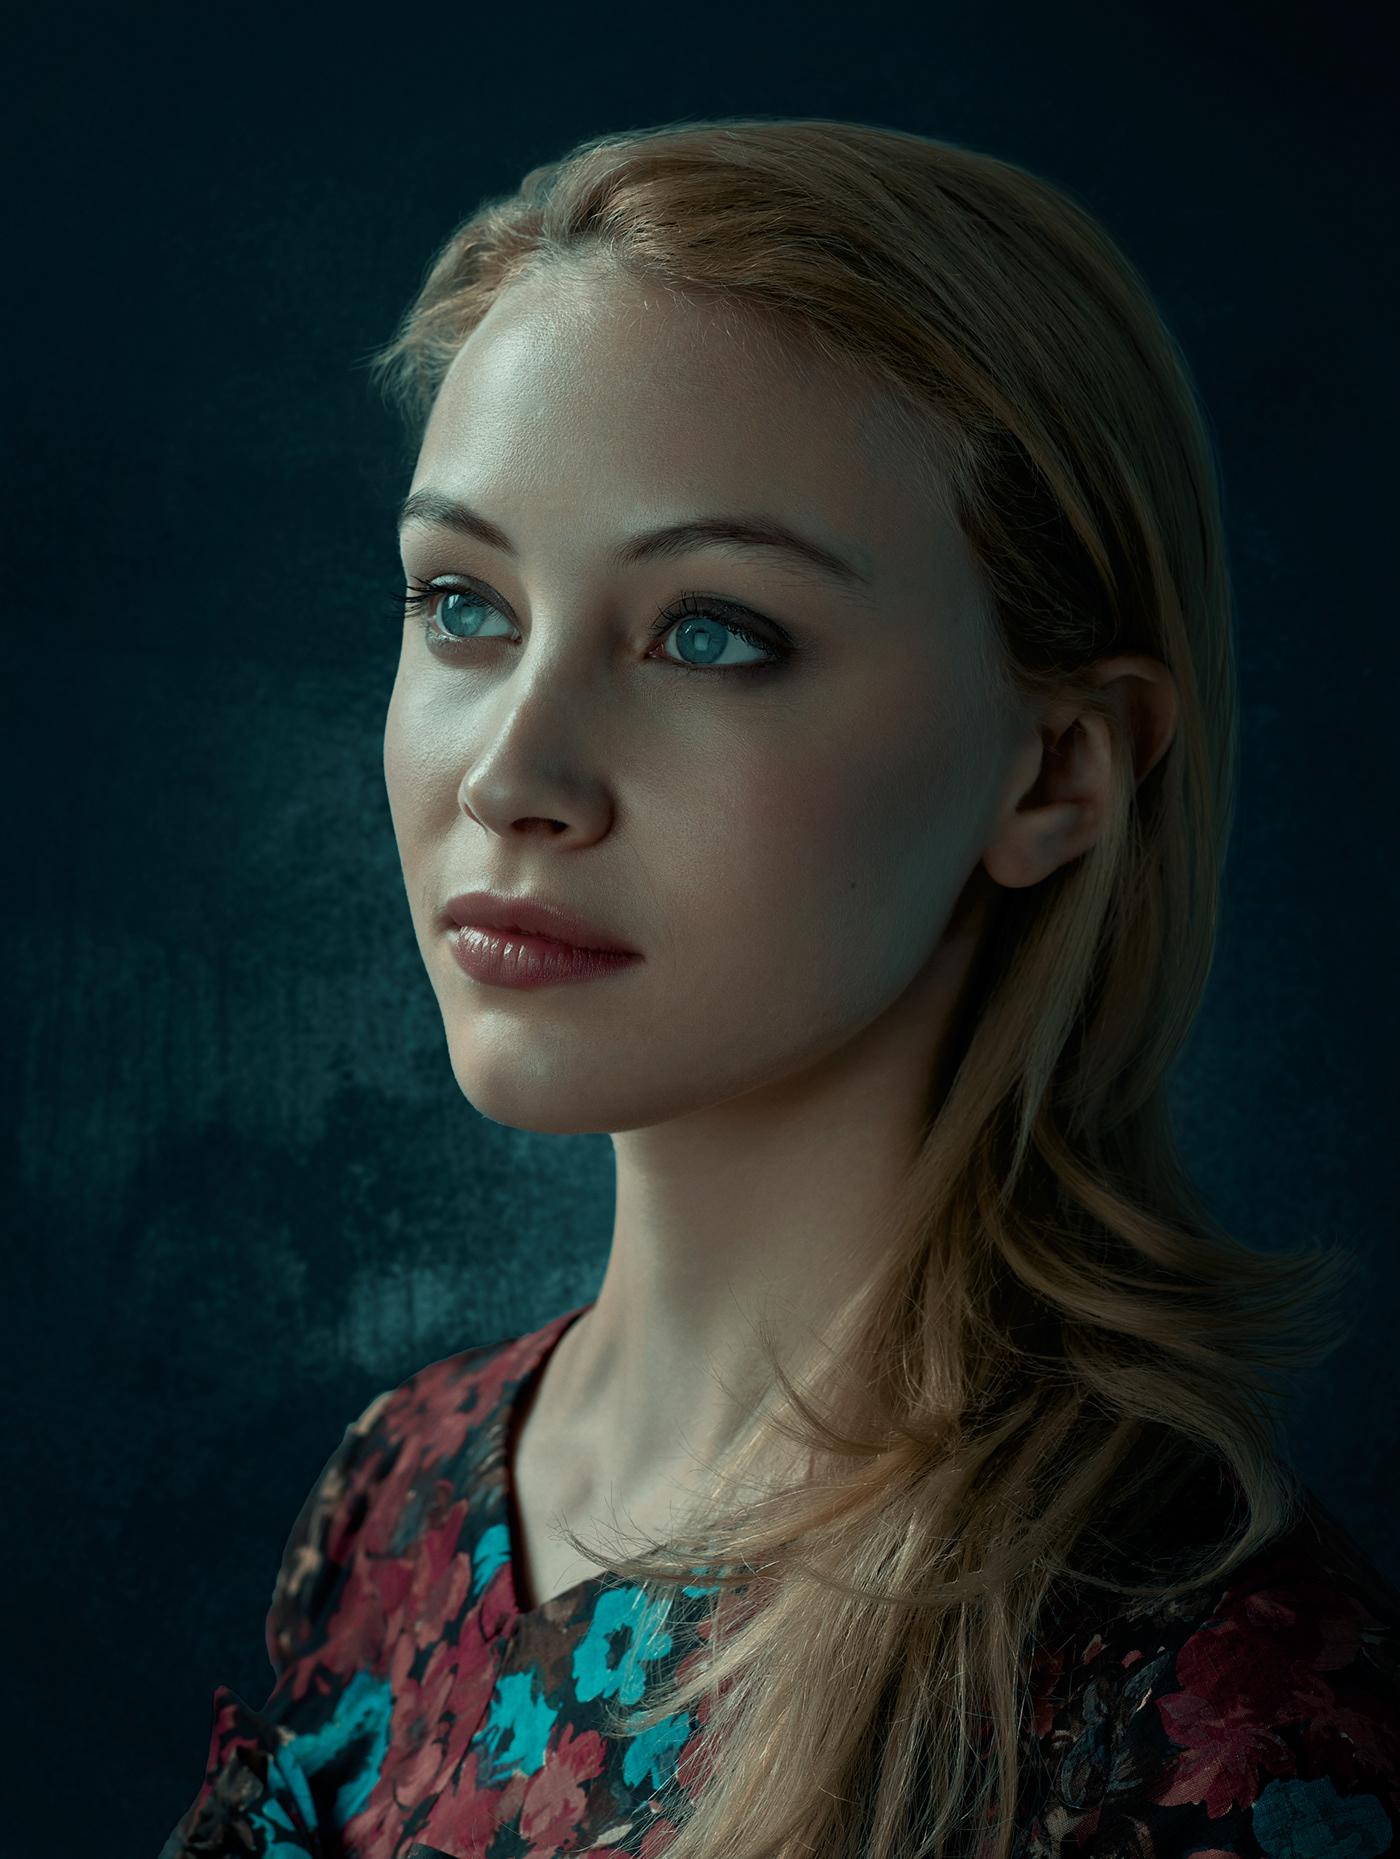 celebrities cinematic color grading Creative Retouching dramatic lighting hollywood lighting portraits